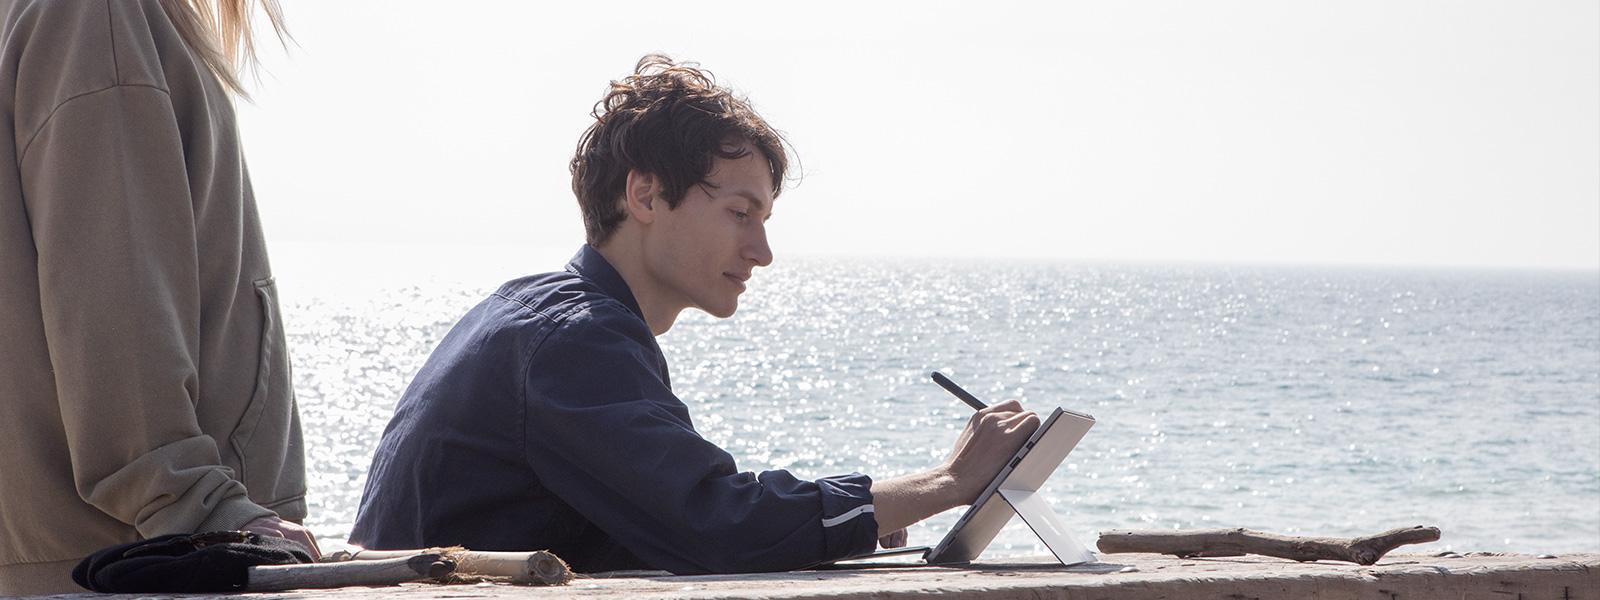 رجل يستخدم جهاز Surface Pro في مكان مفتوح.